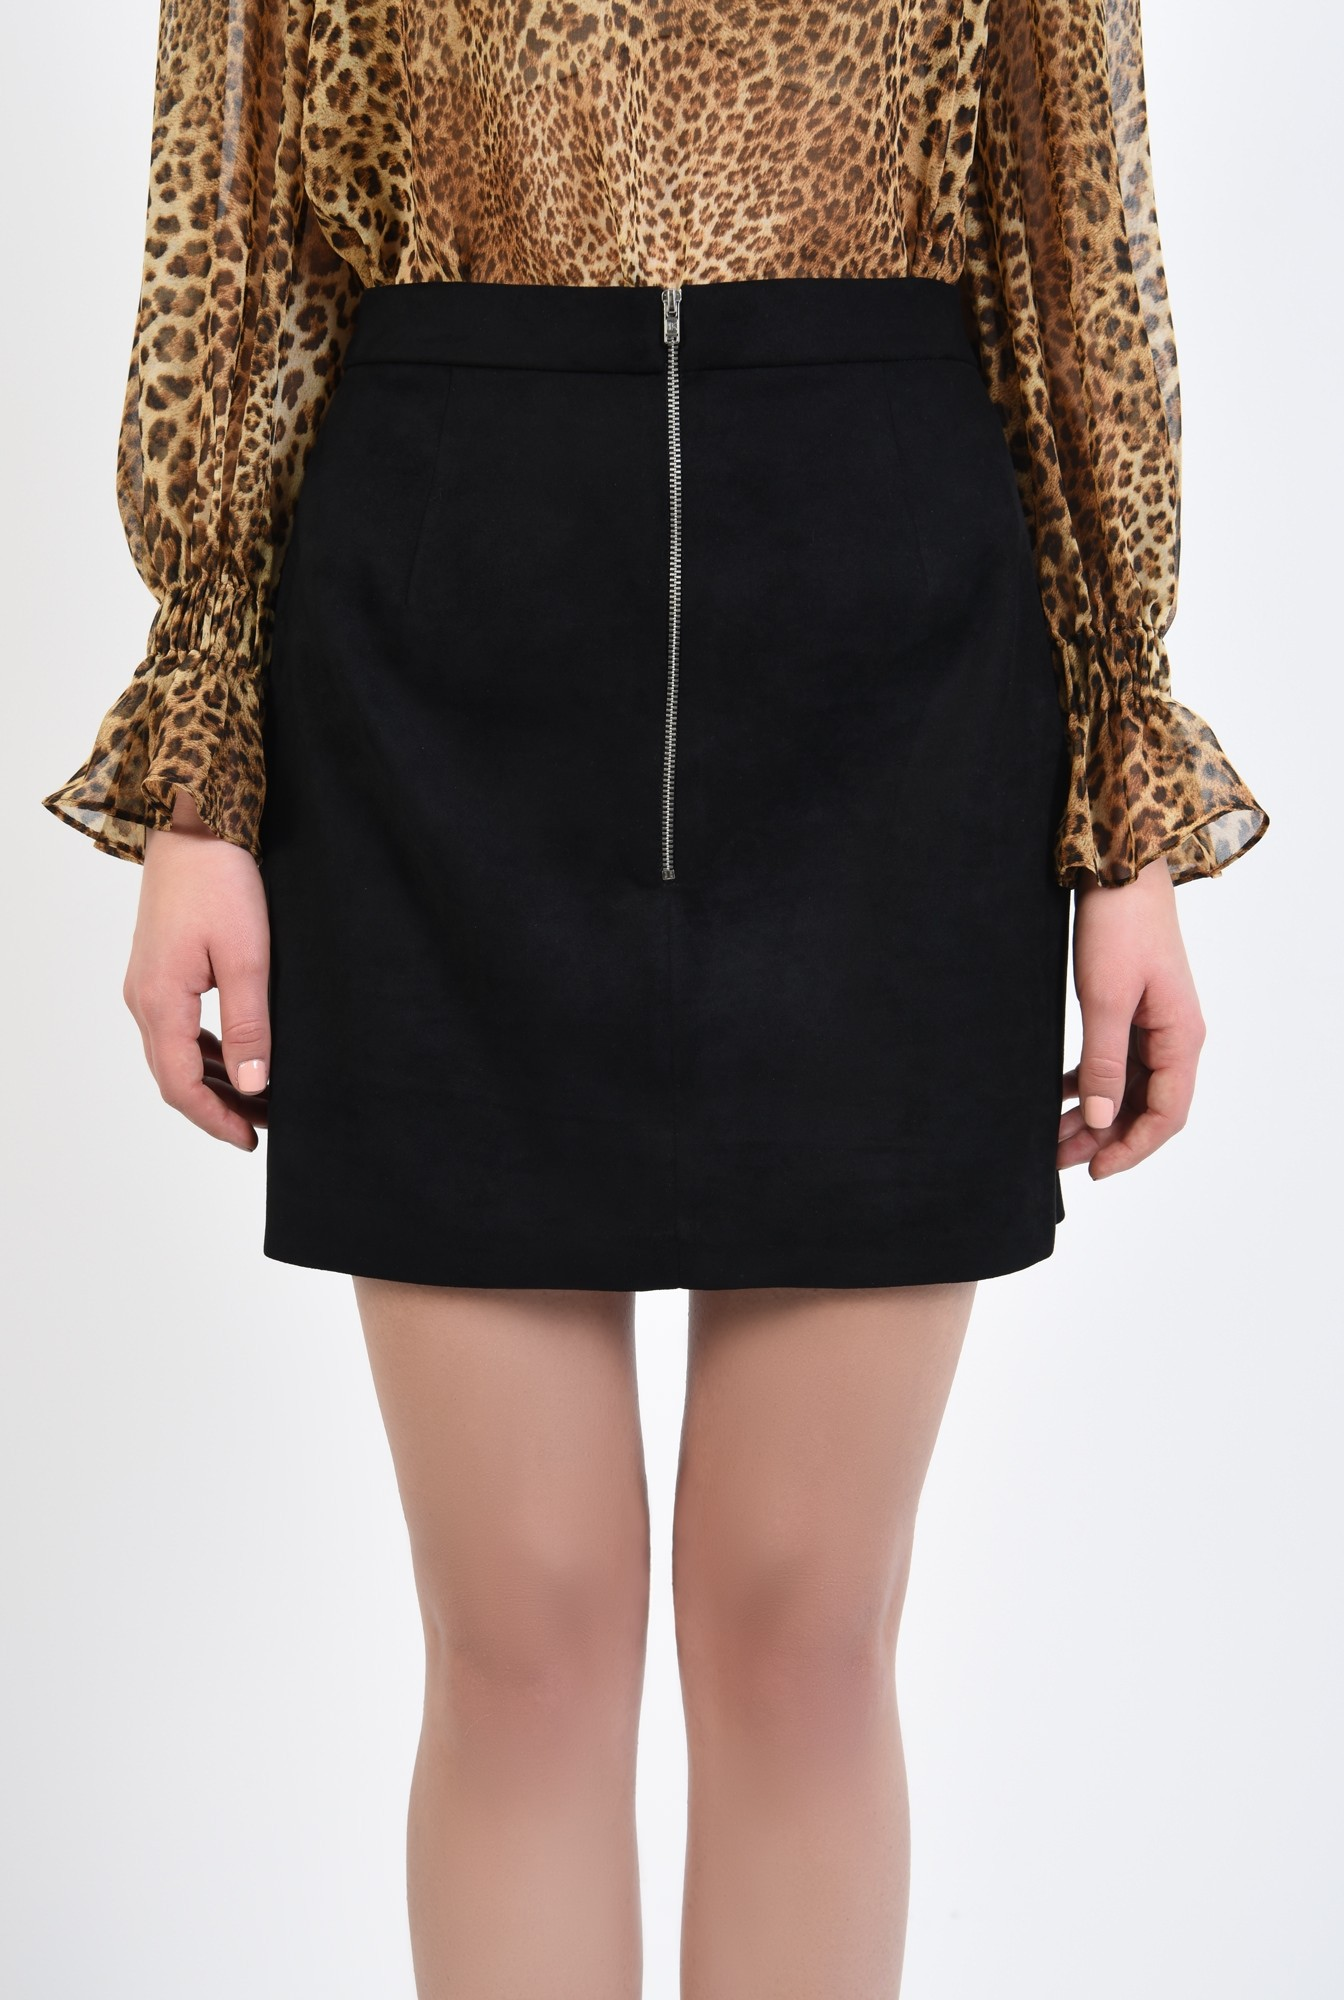 2 - fusta neagra, mini, croi drept, piele intoarsa, fermoar metalic functional